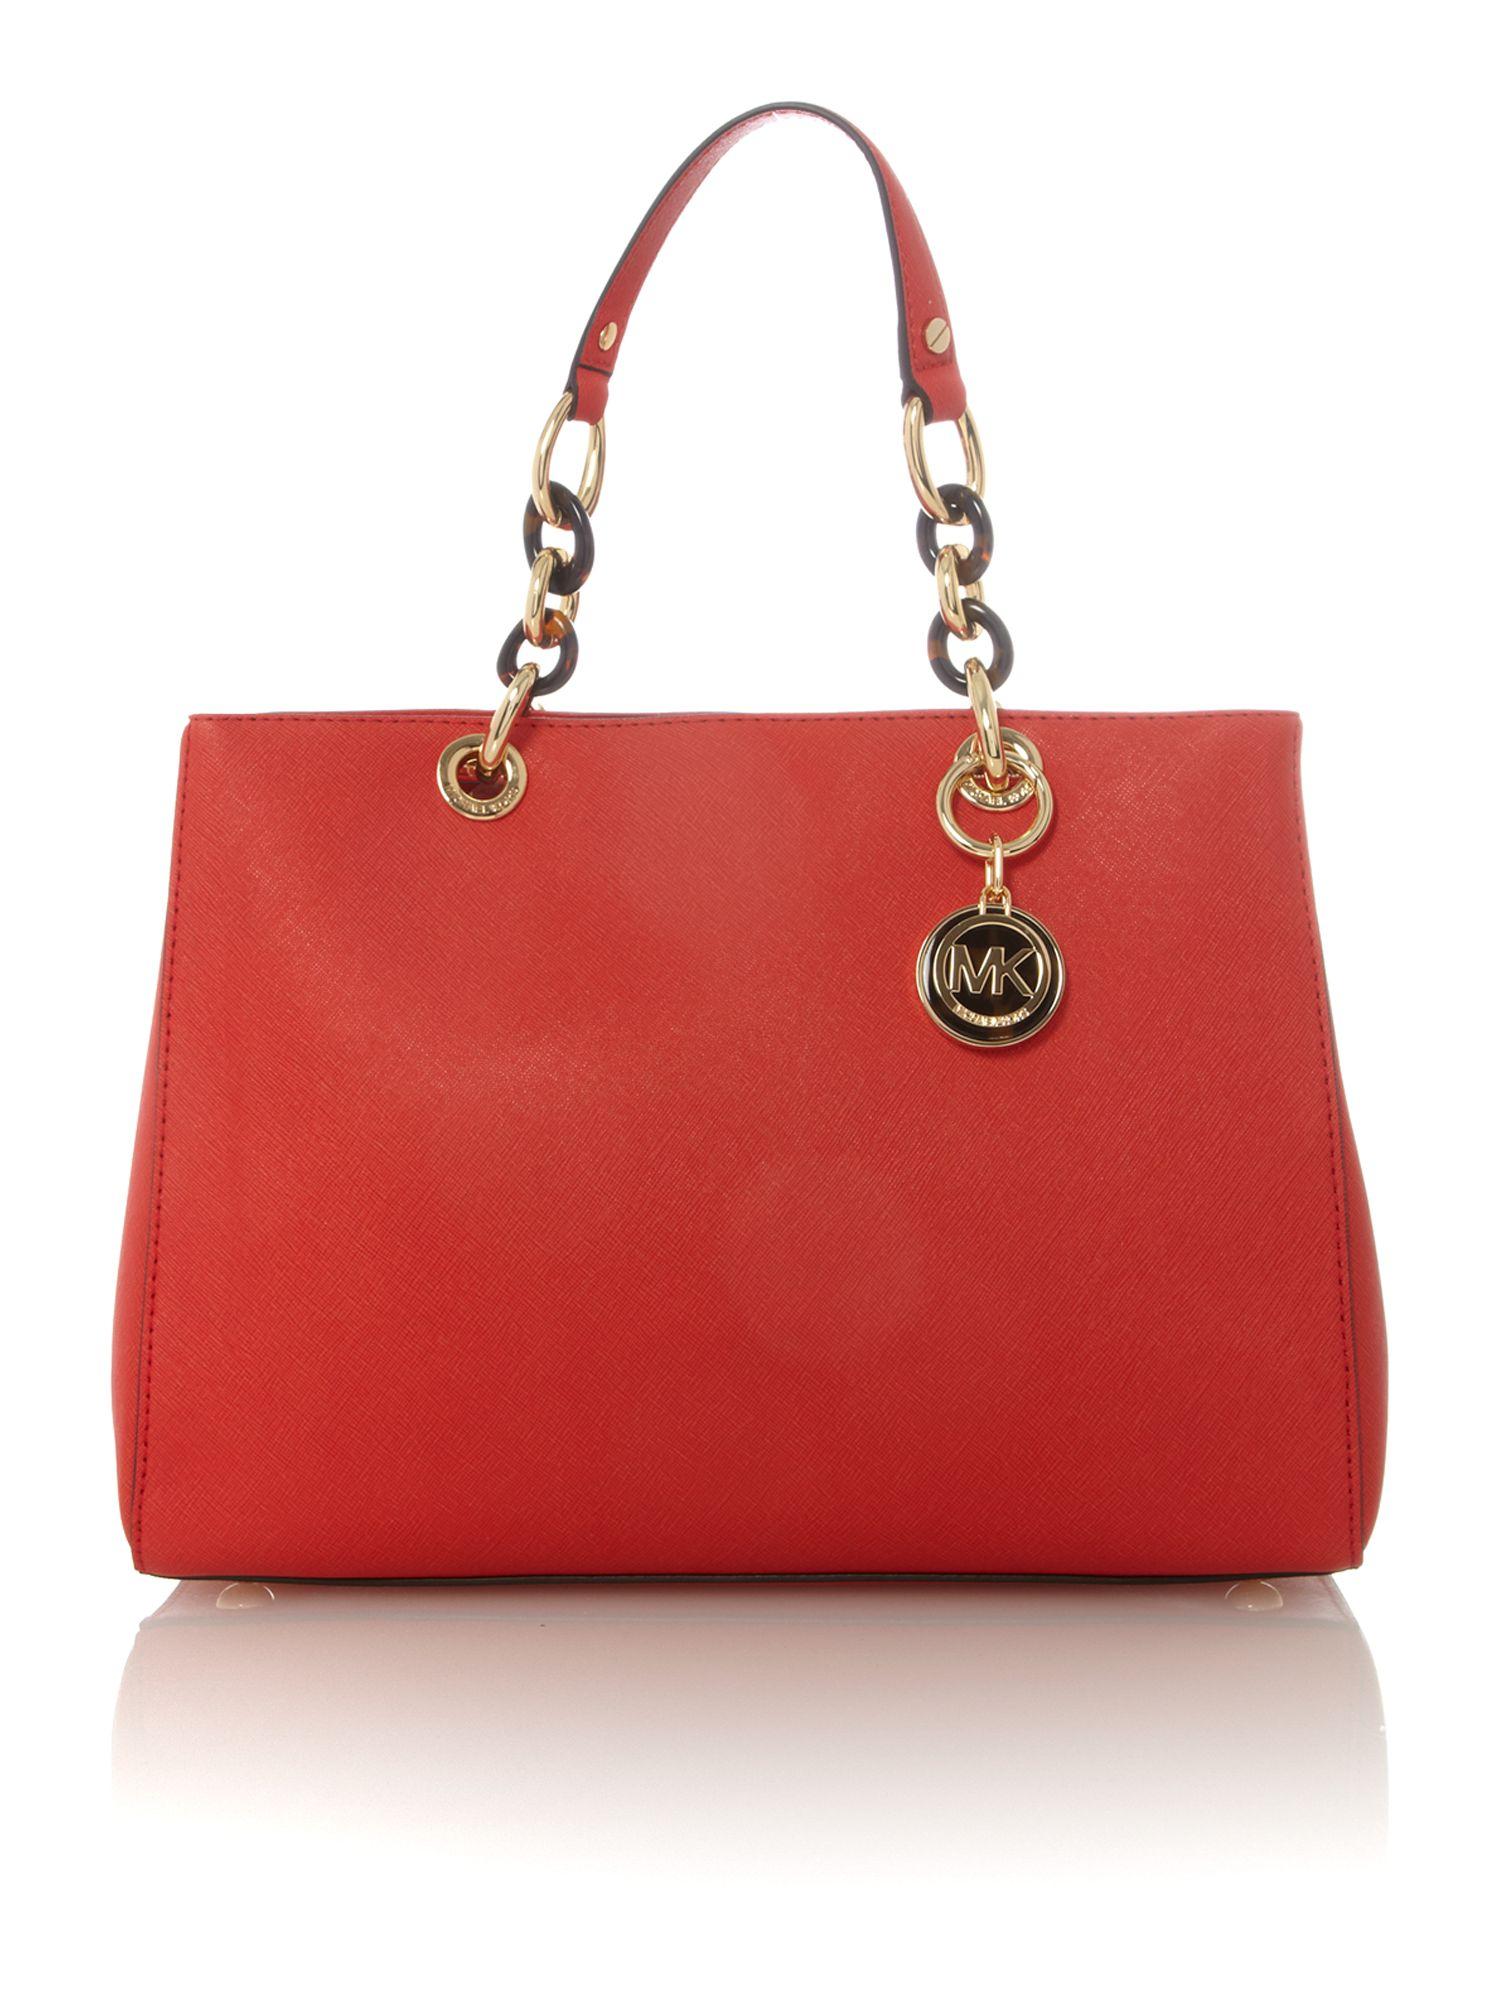 Michael Kors Cynthia Red Ew Tote Bag